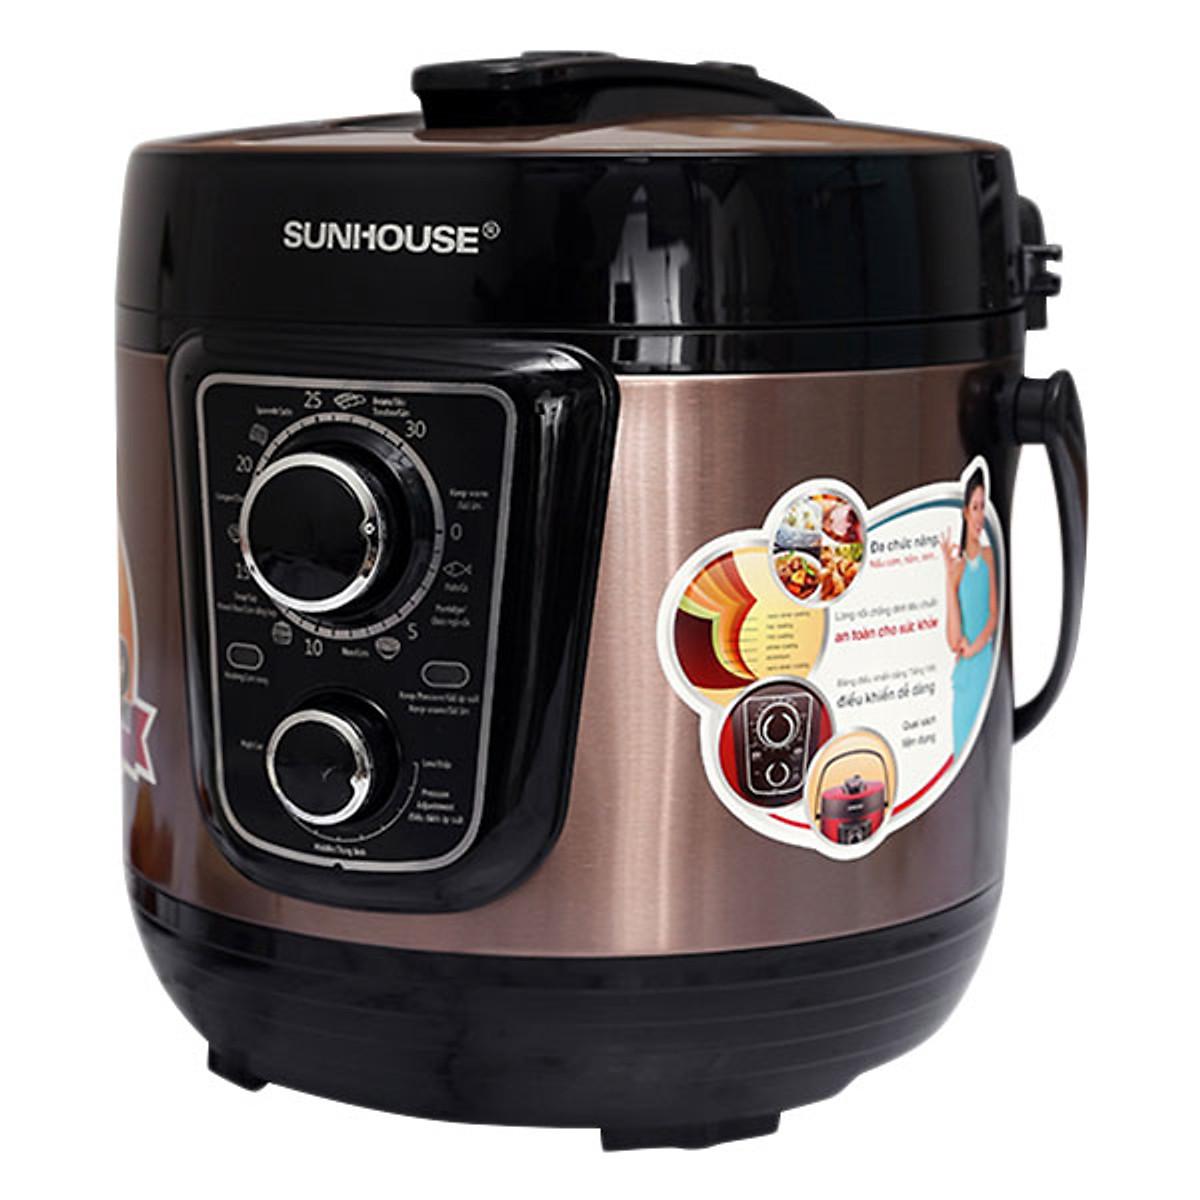 Đánh giá Nồi Áp Suất Sunhouse SHD1659 (5.0L) - Màu Cafe